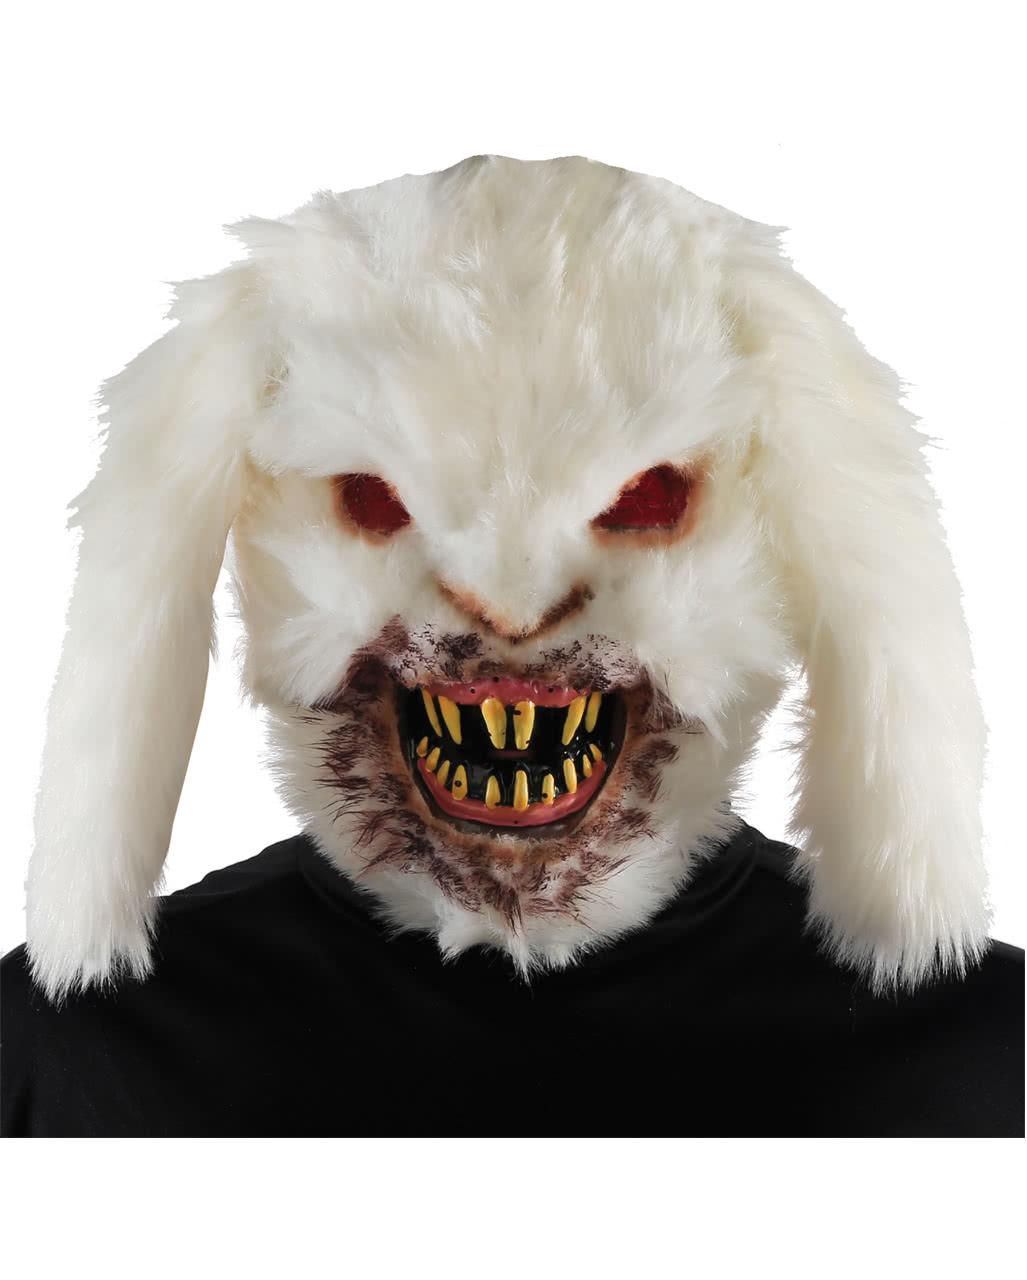 evil bunny hare mask for halloween